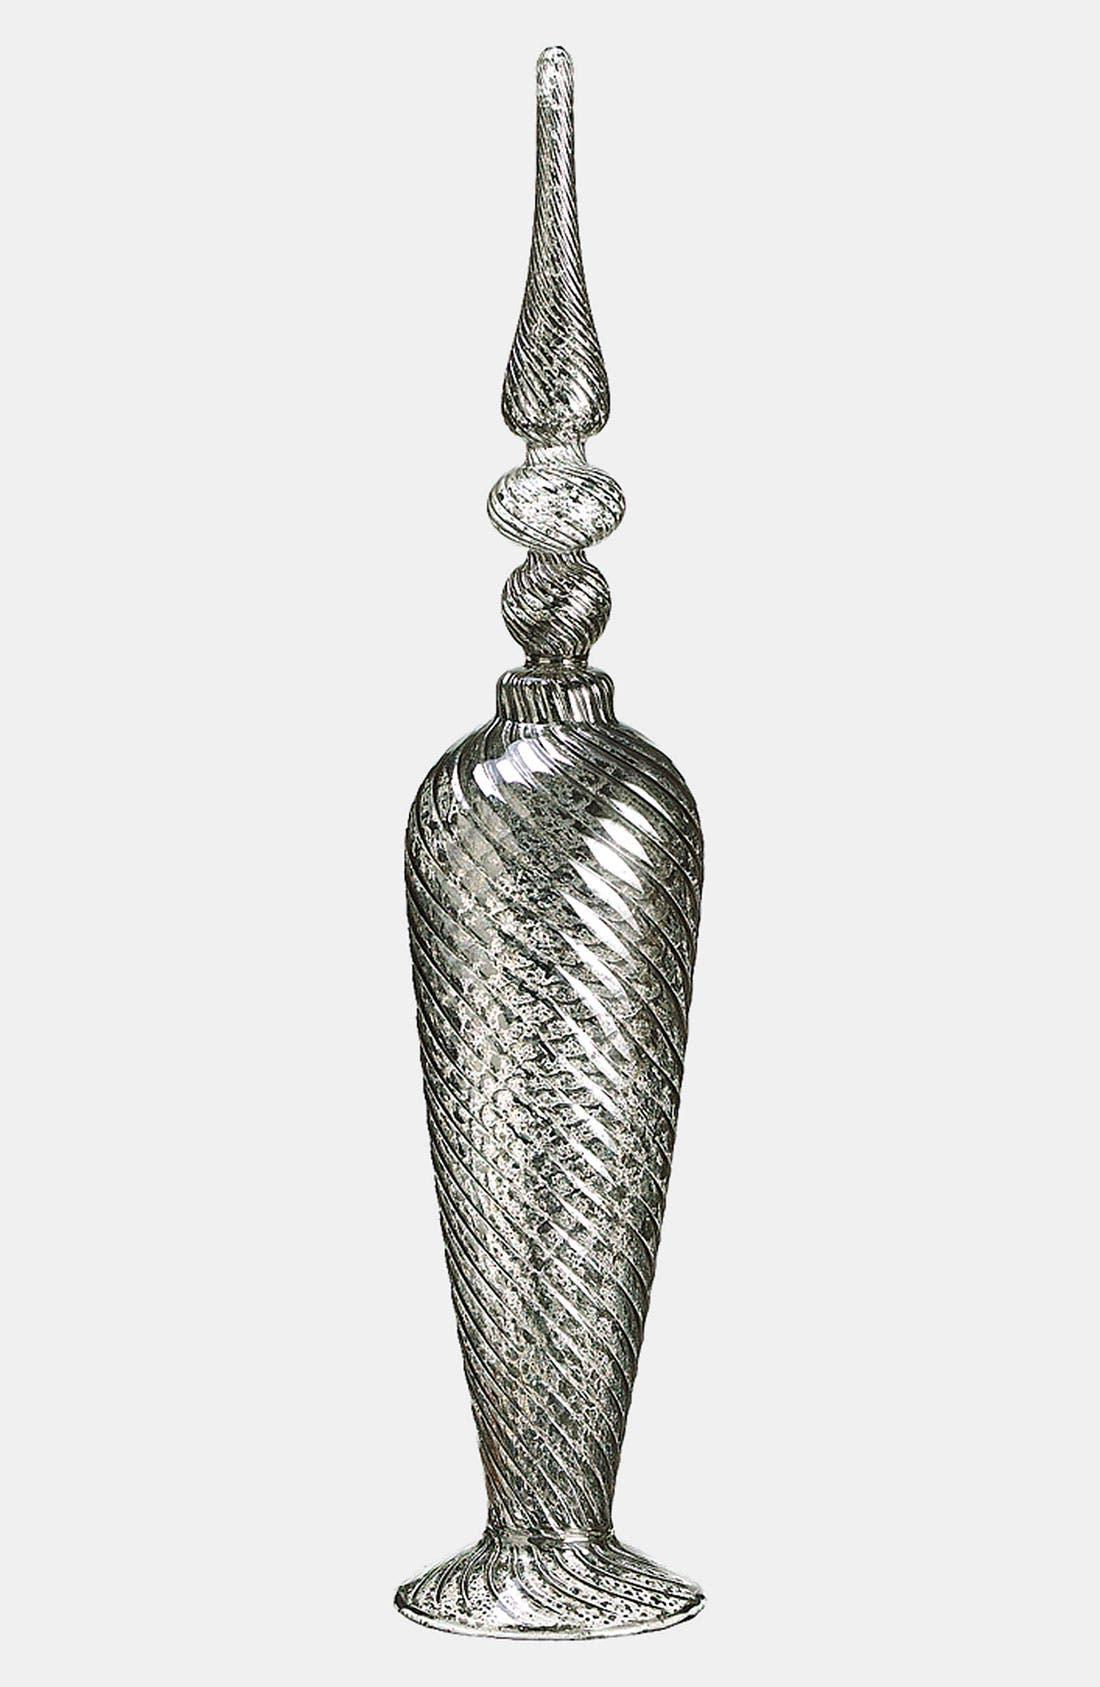 Alternate Image 1 Selected - ALLSTATE Glass Swirl Finial